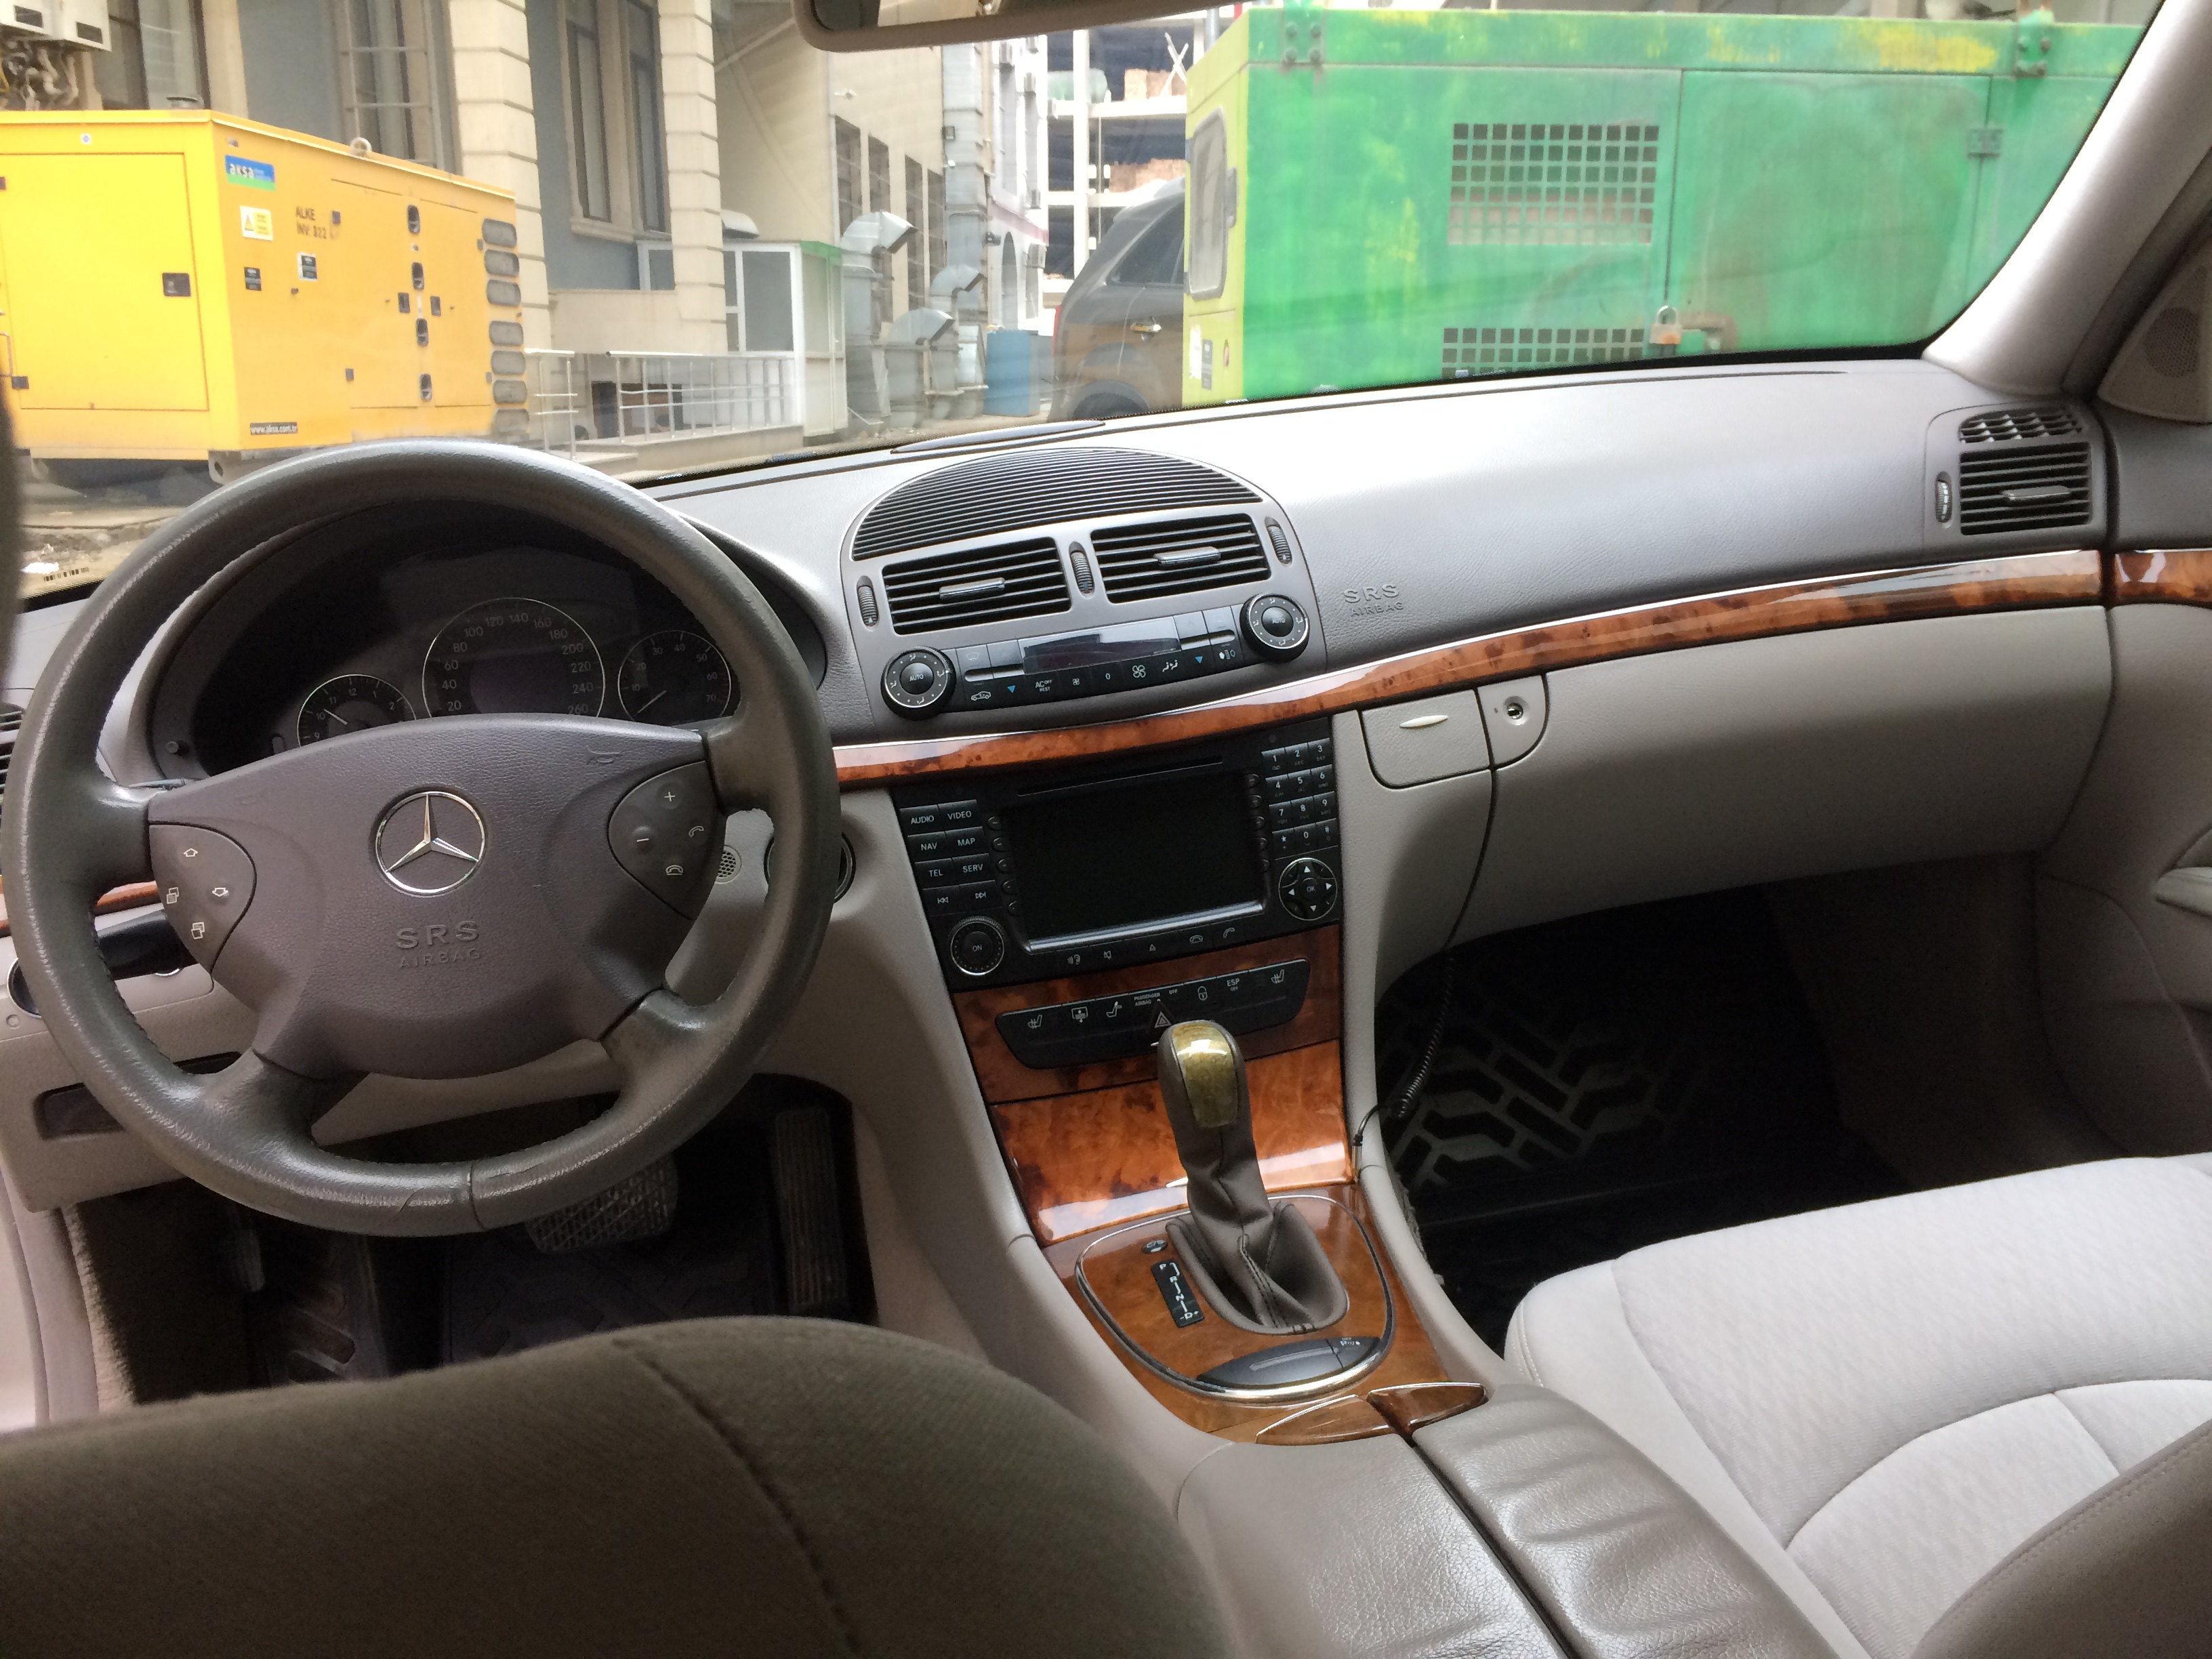 Mercedes-Benz E 320 3.2(lt) 2003 İkinci əl  $16000